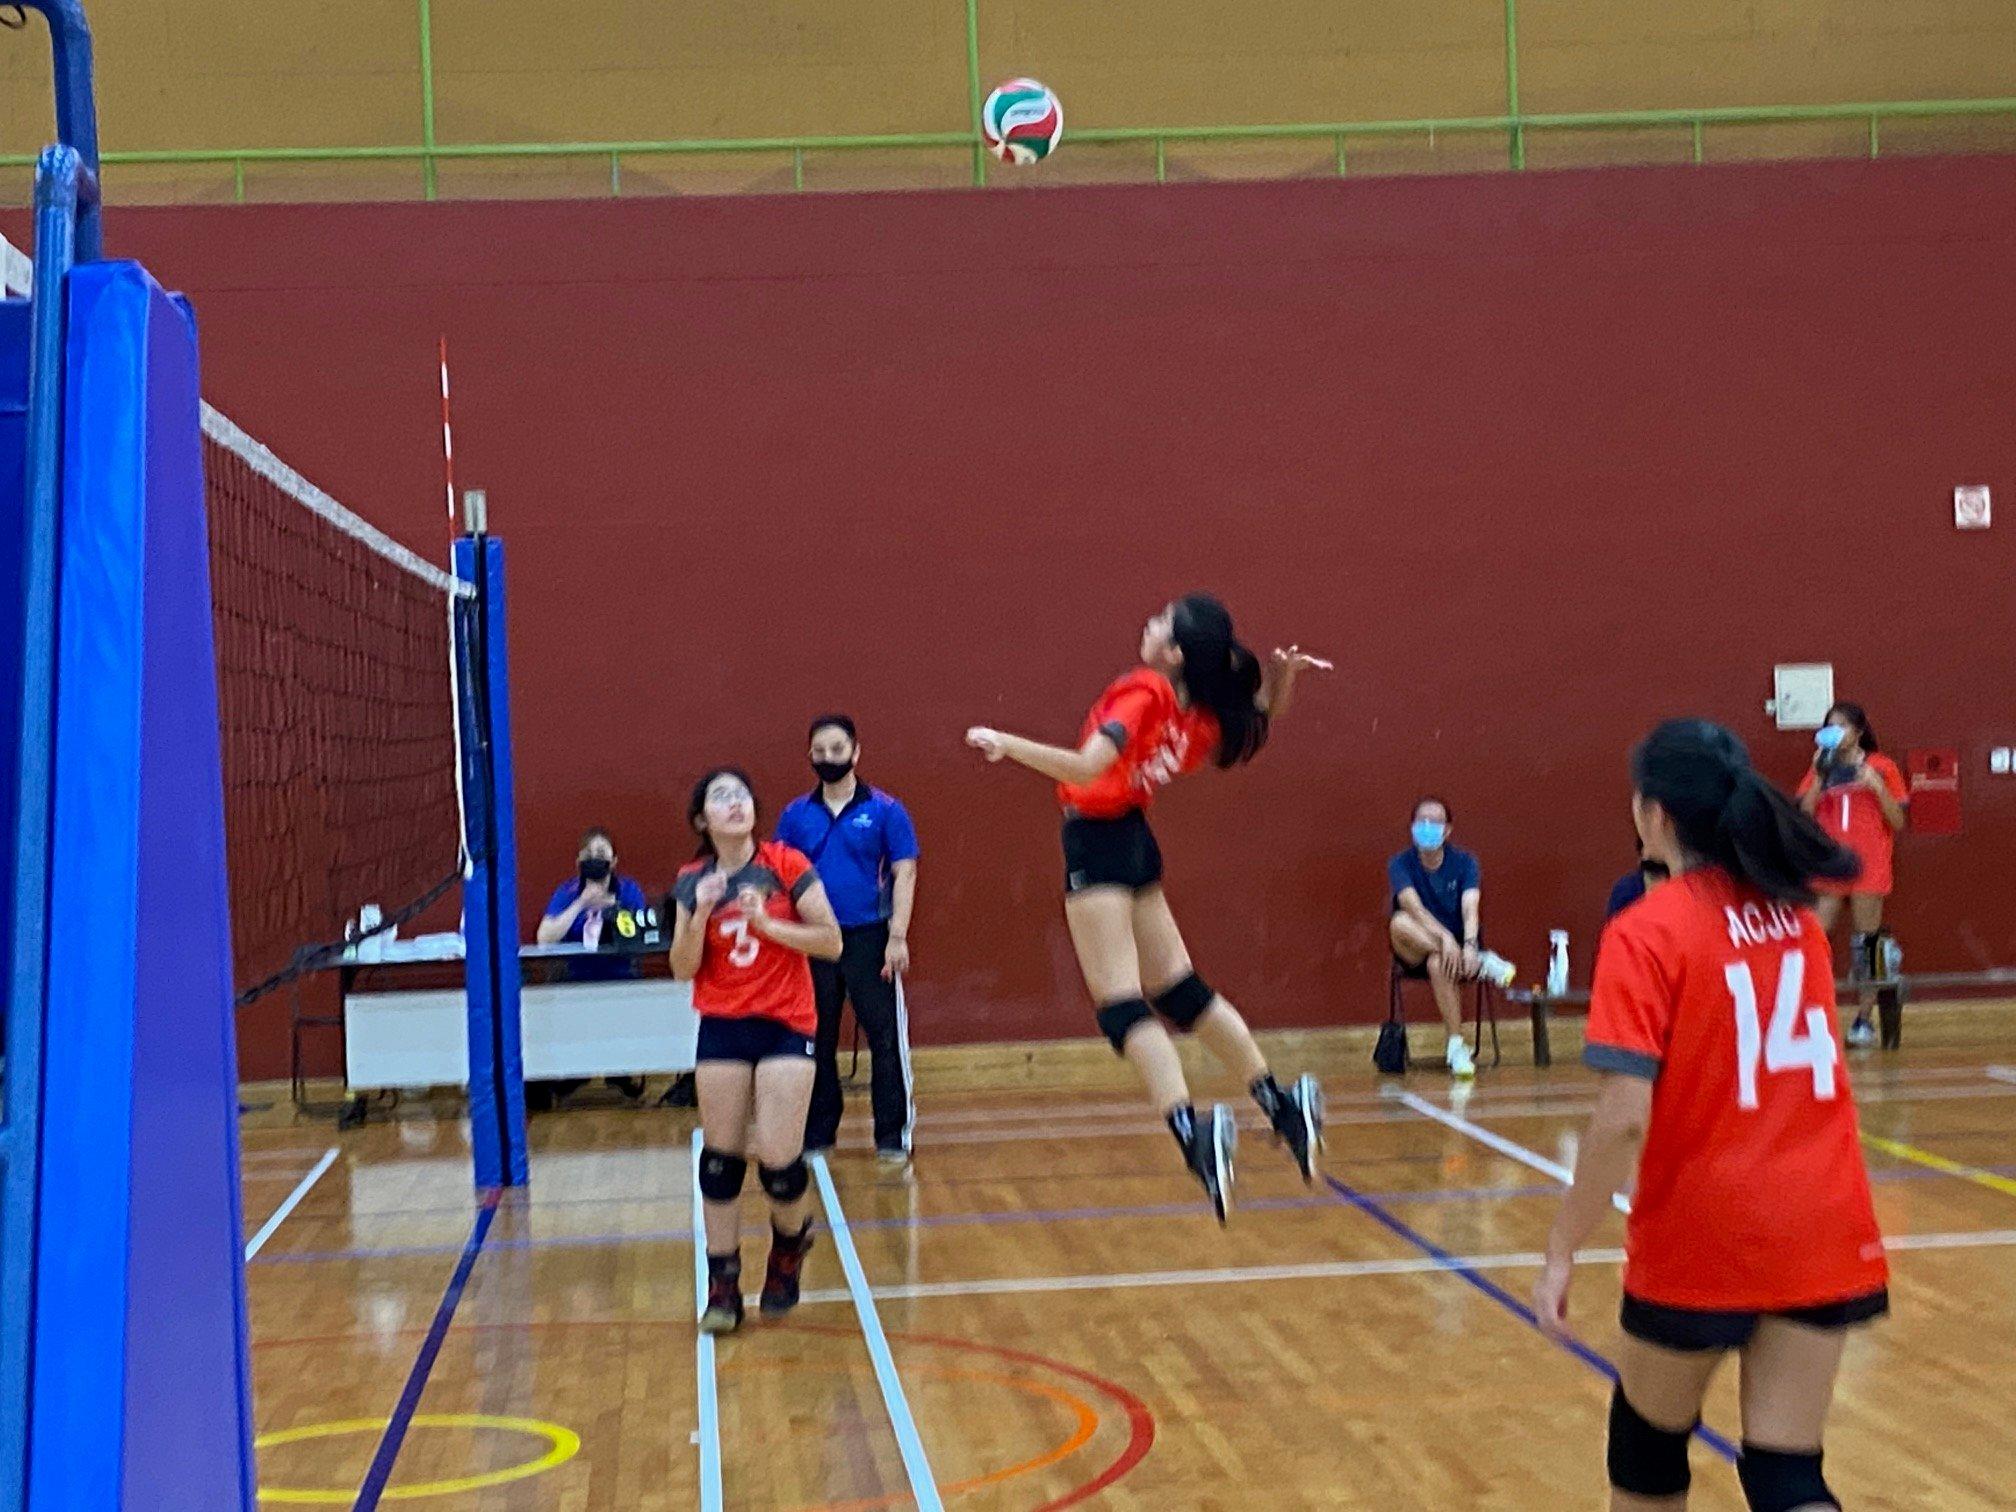 NSG A Div girls' volleyball prelim rd - ACJC (red) vs TJC (black) 5